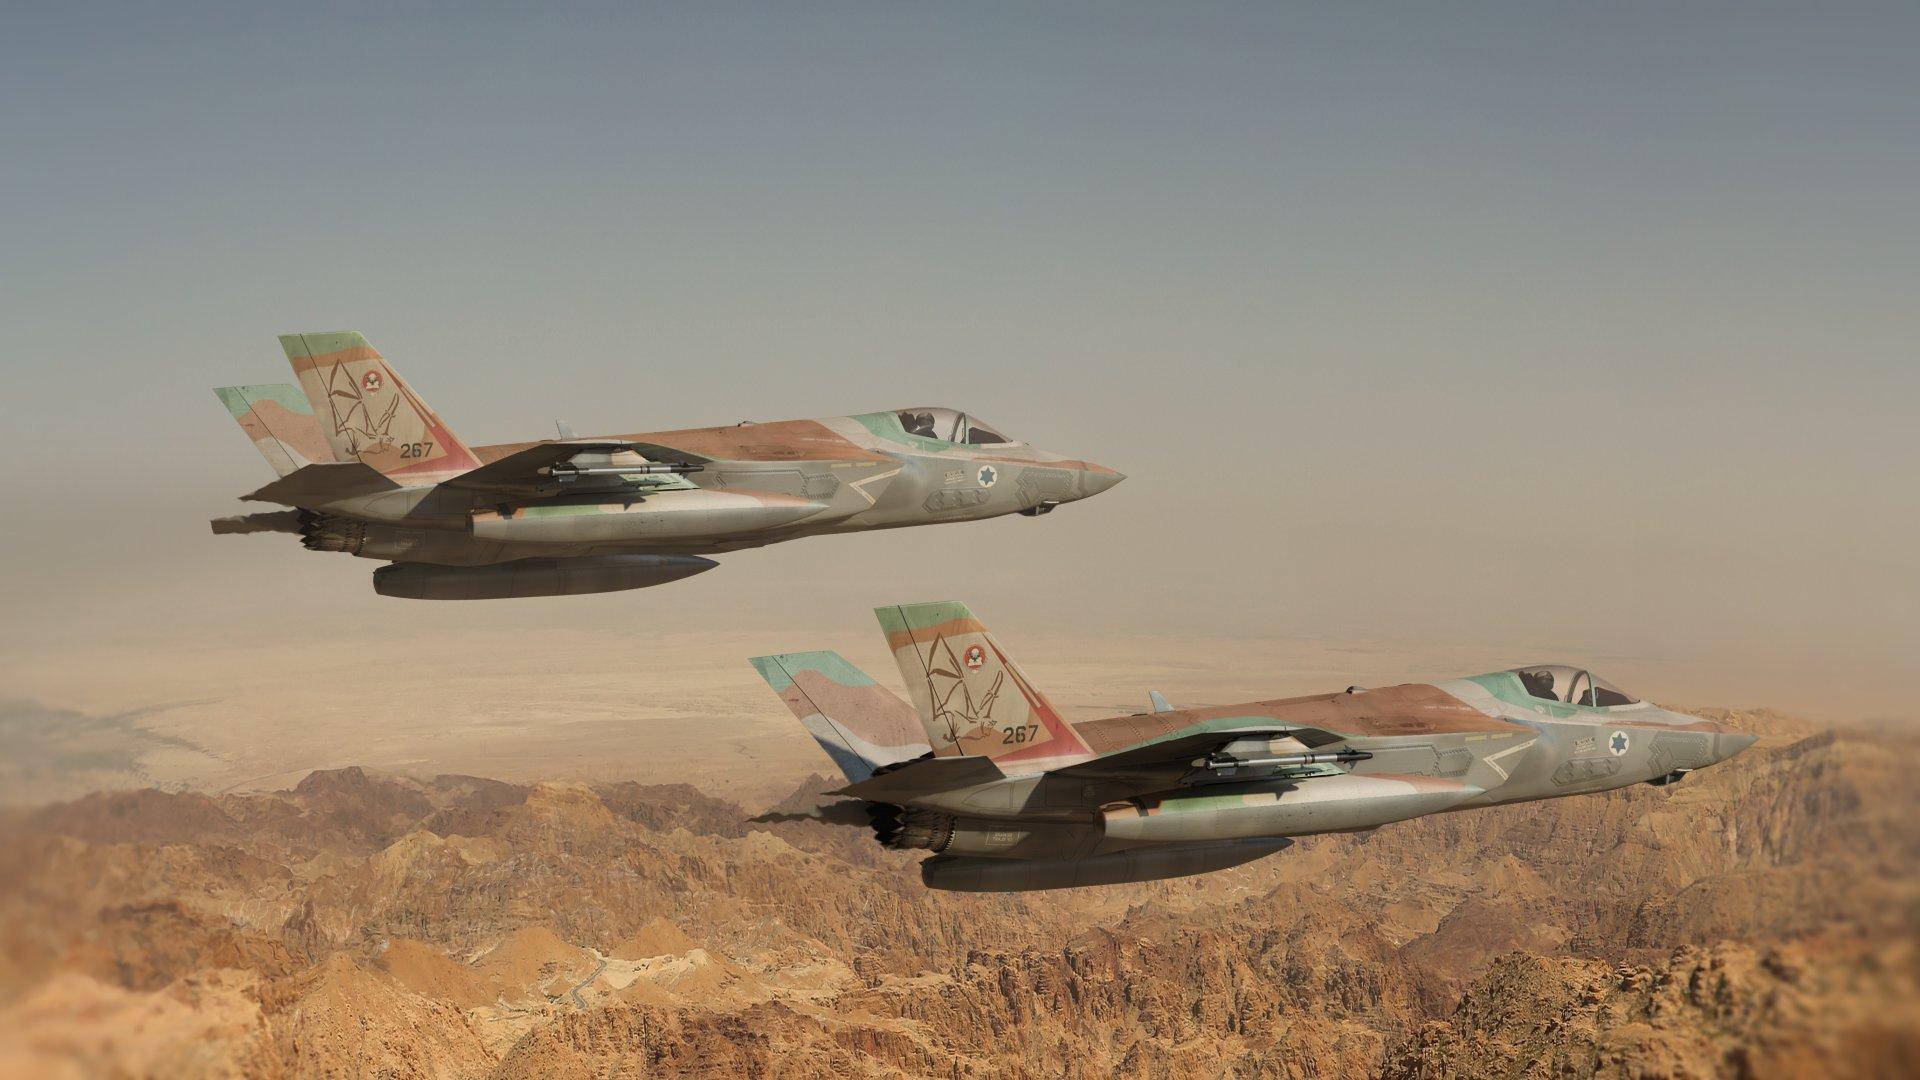 ofer-shafir-double-formation-passes-shot-sky-2-00020